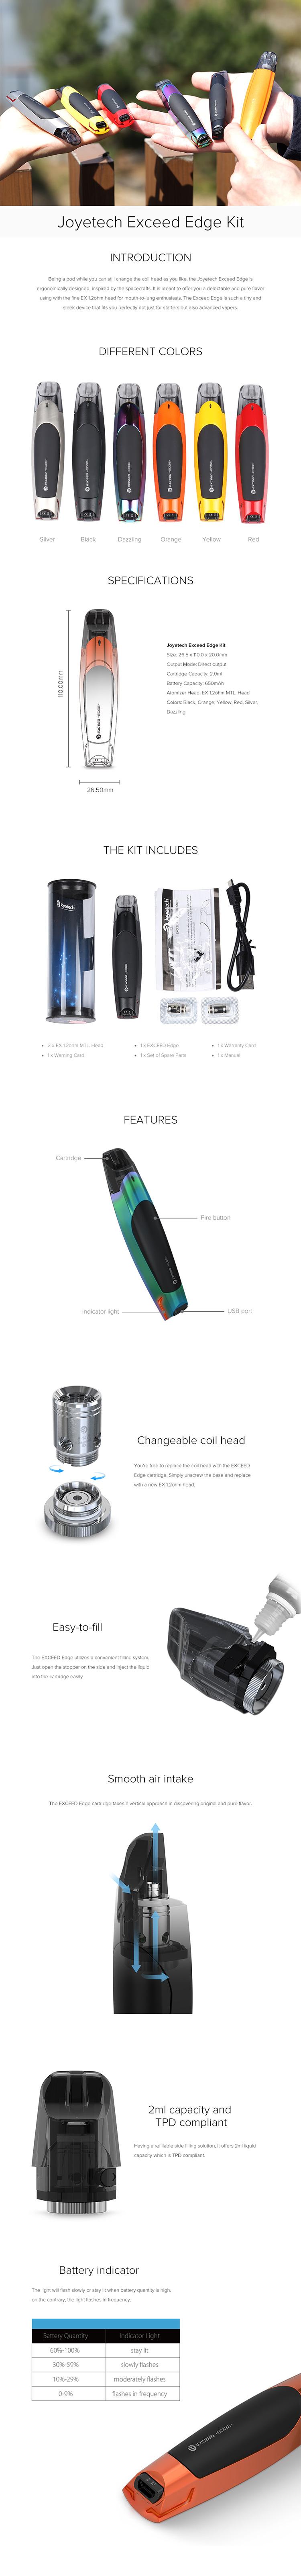 Joyetech EXCEED Edge Pod System Kit